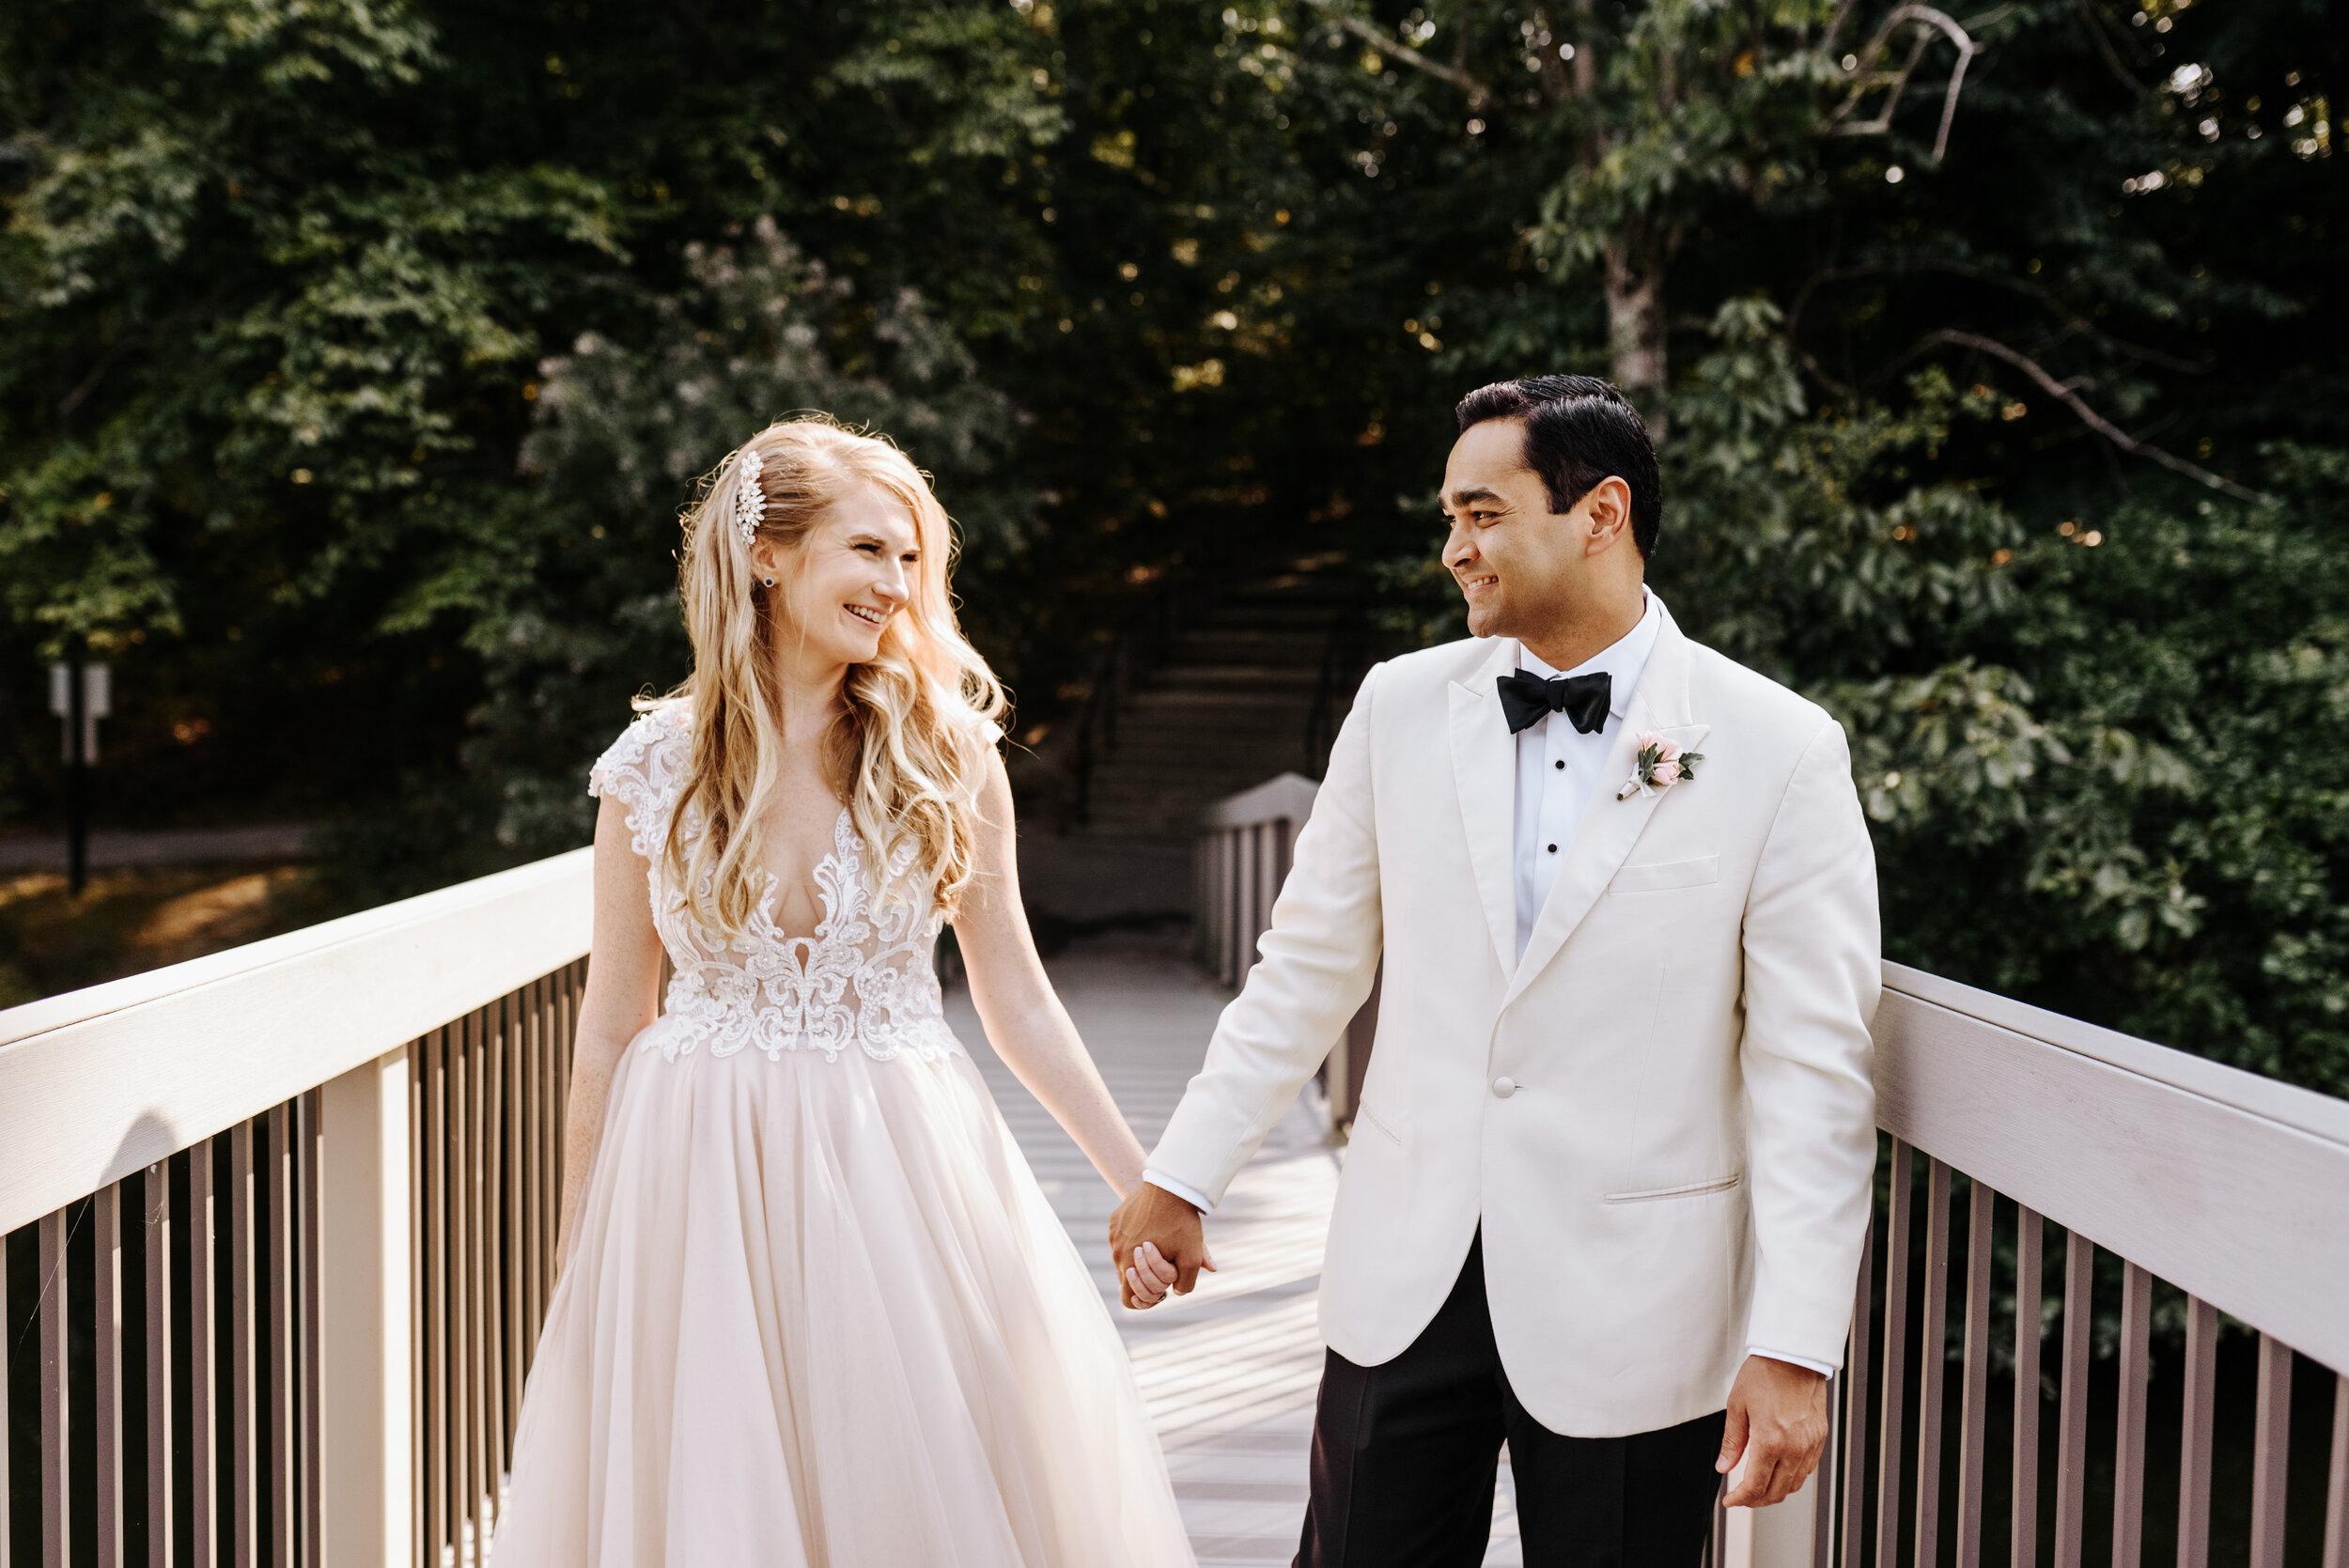 Cassie-Mrunal-Wedding-Quirk-Hotel-John-Marshall-Ballrooms-Richmond-Virginia-Photography-by-V-46.jpg